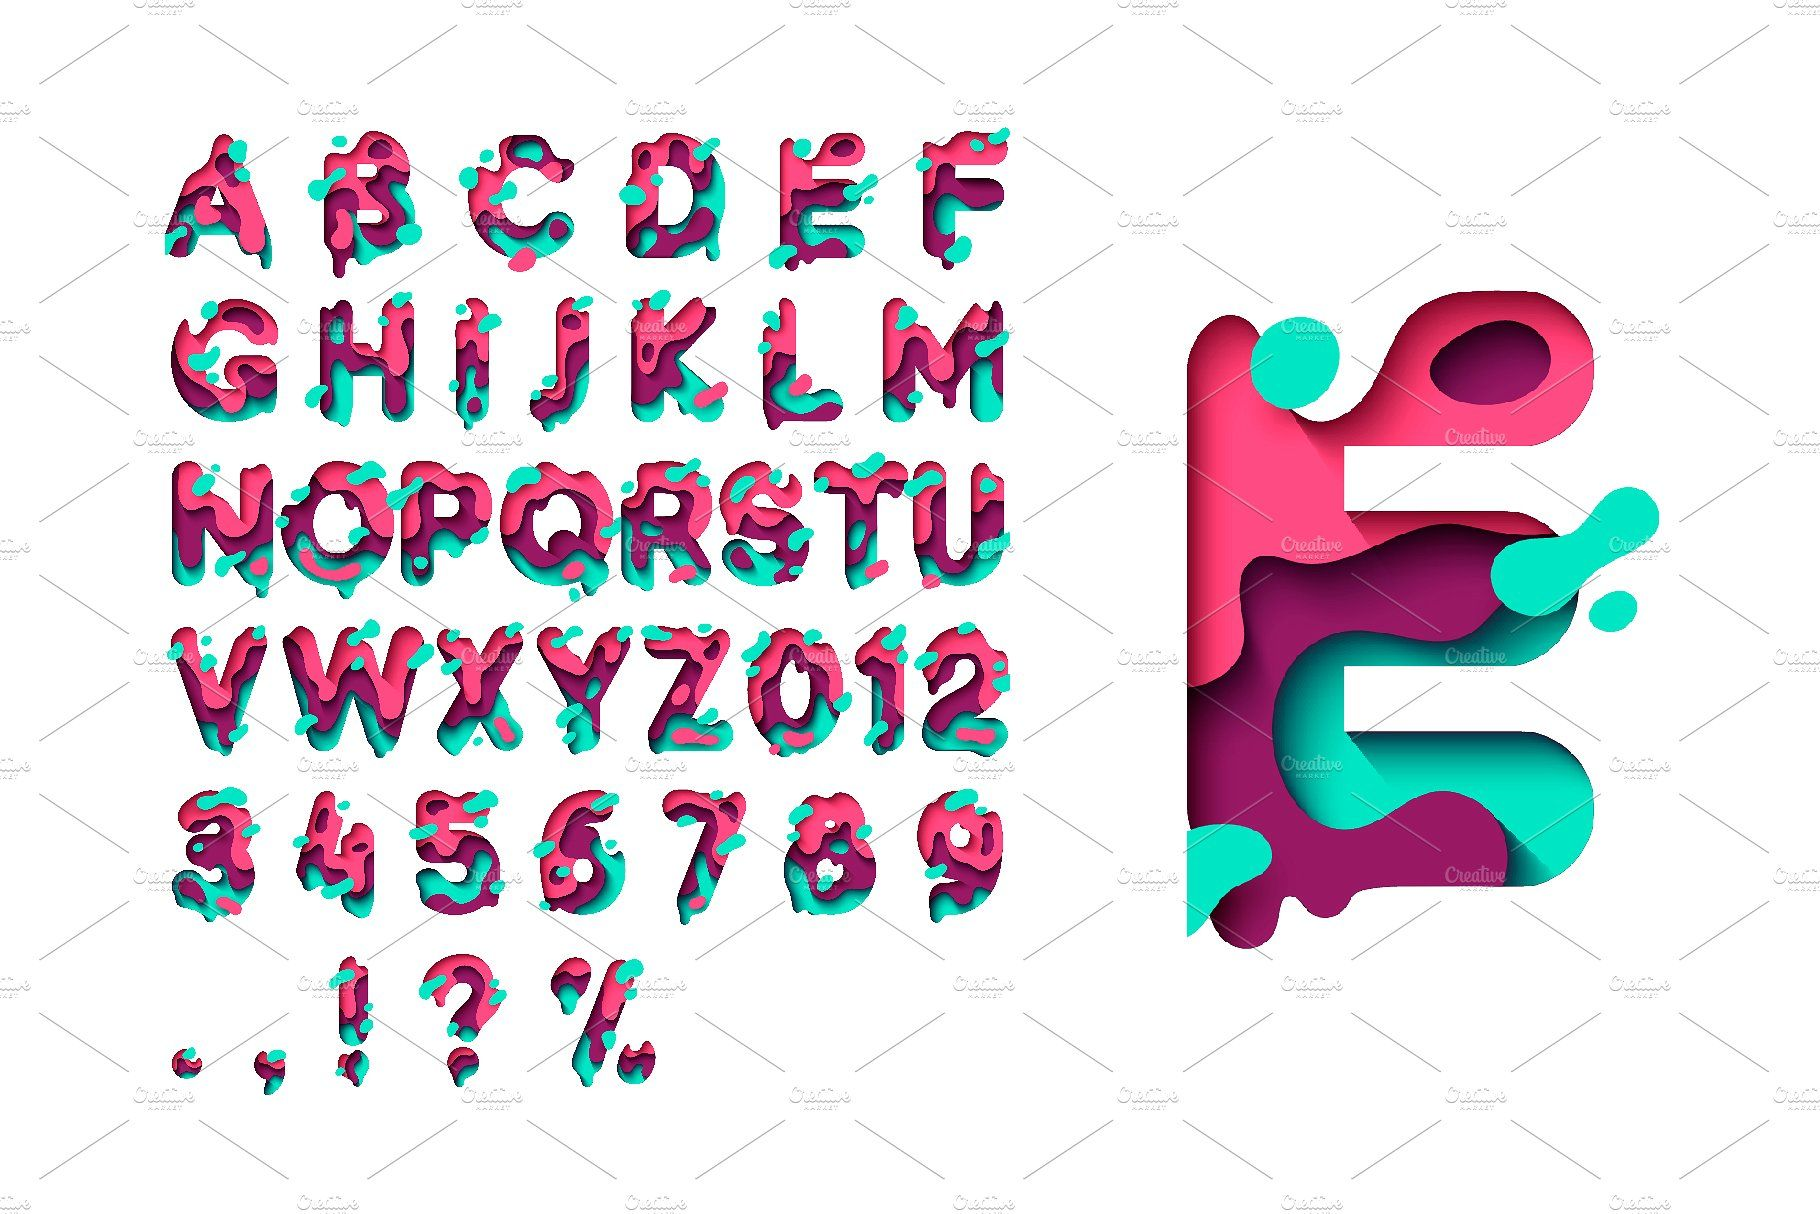 PAPER style OTFSVG Font overlayeffectsLayerContent